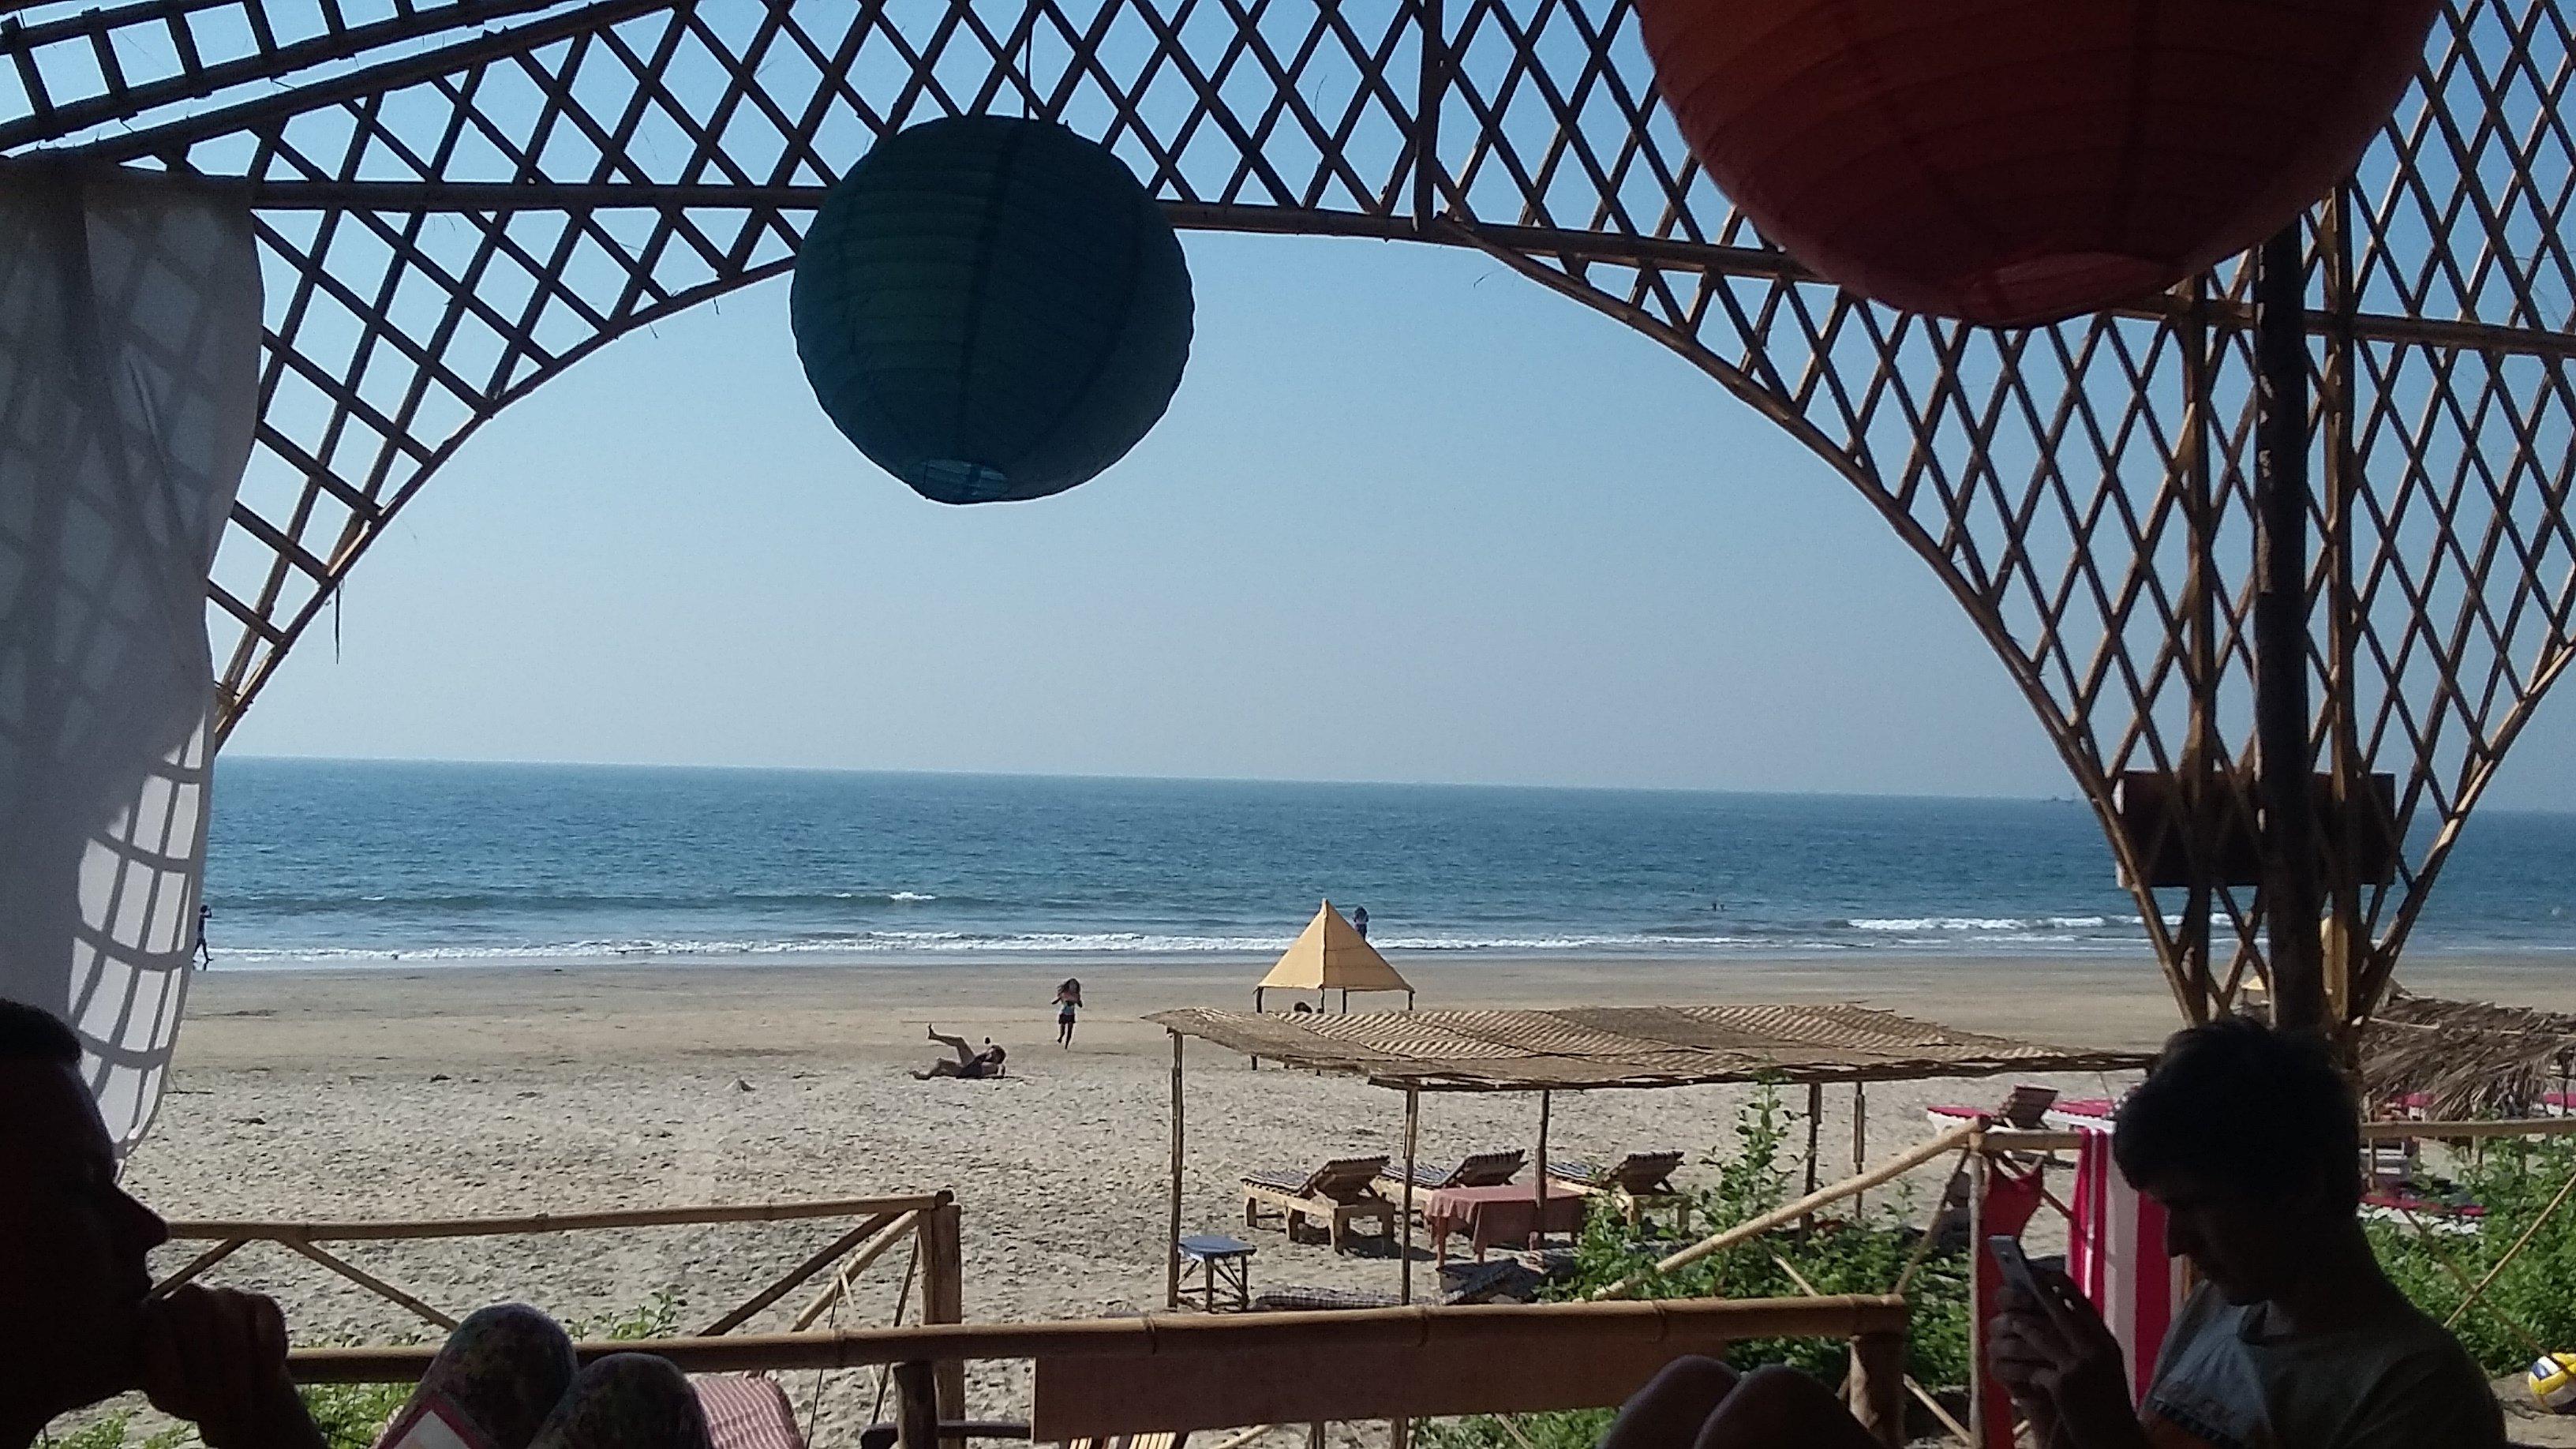 Cabowabo Goa